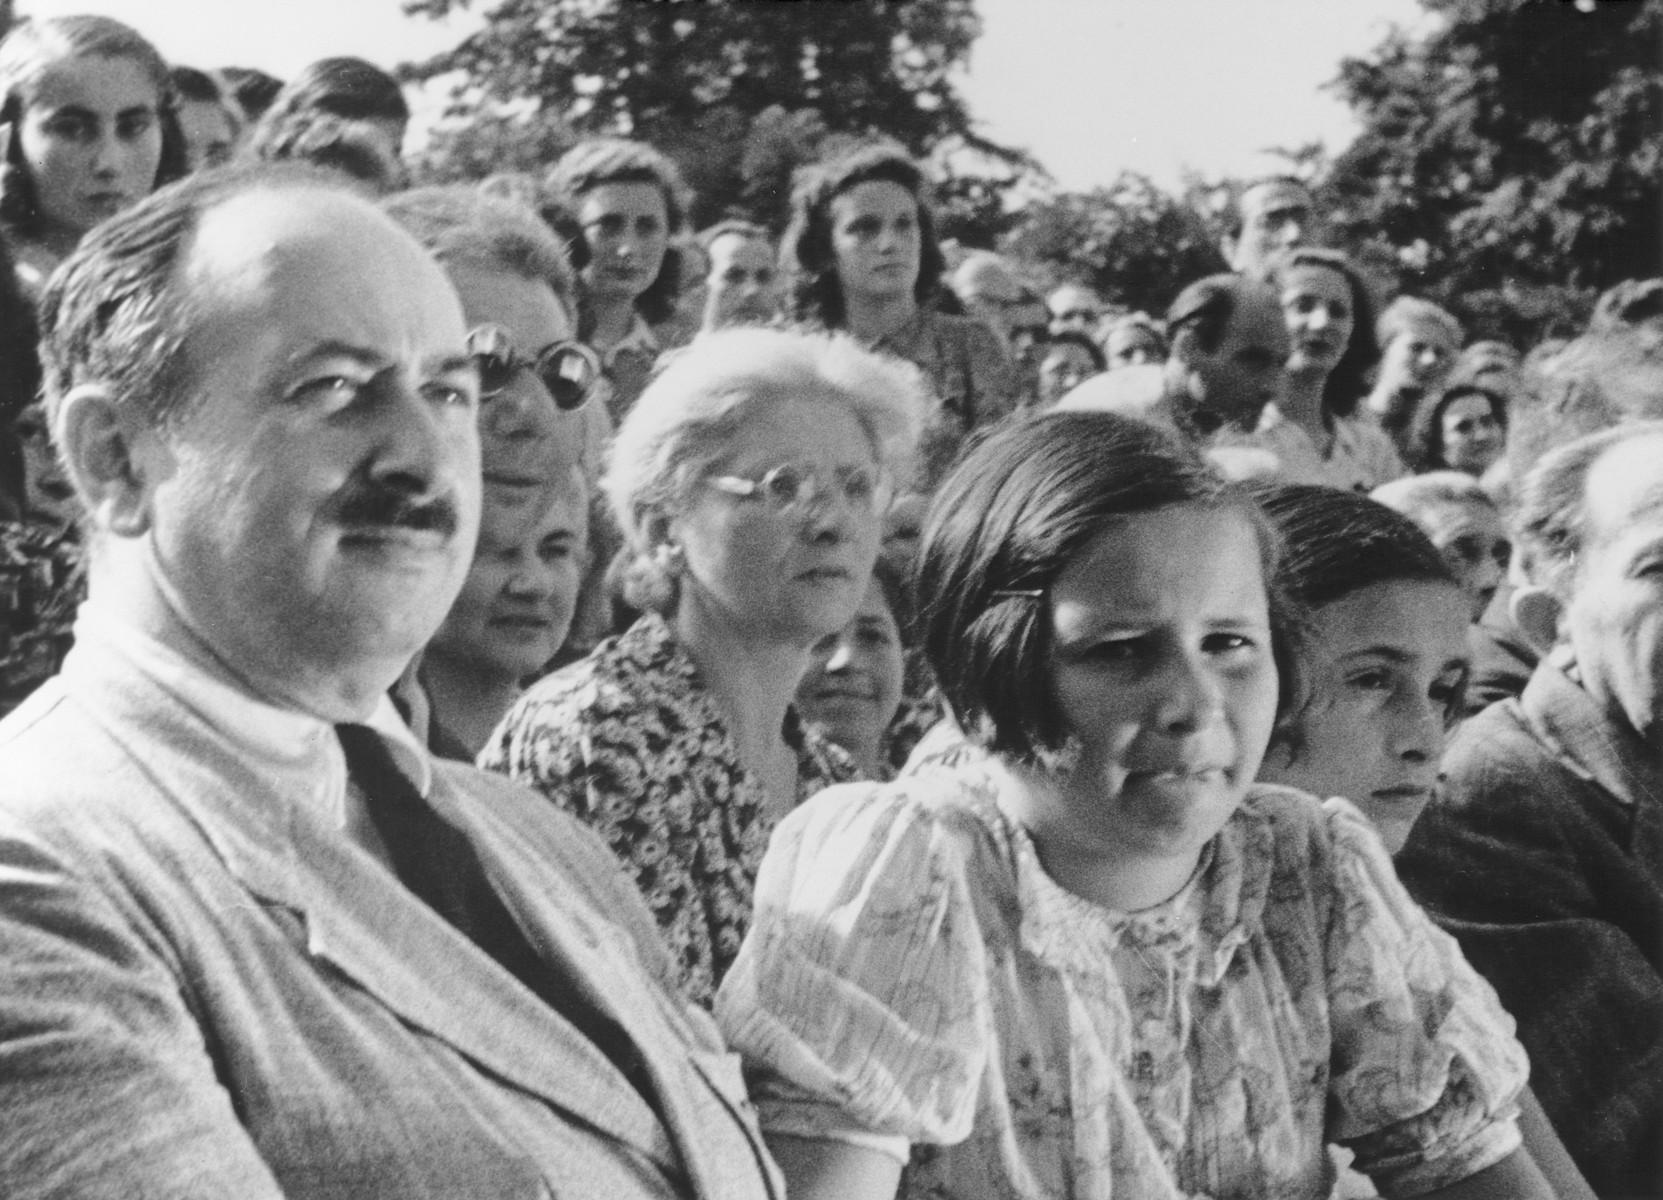 "STILL PHOTOGRAPH FROM THE NAZI PROPAGANDA FILM, ""Der Fuehrer Schenkt den Juden eine Stadt"" [The Fuehrer gives the Jews a City].  Prisoners sitting outside watch an outdoor event at the Theresienstadt concentration camp."